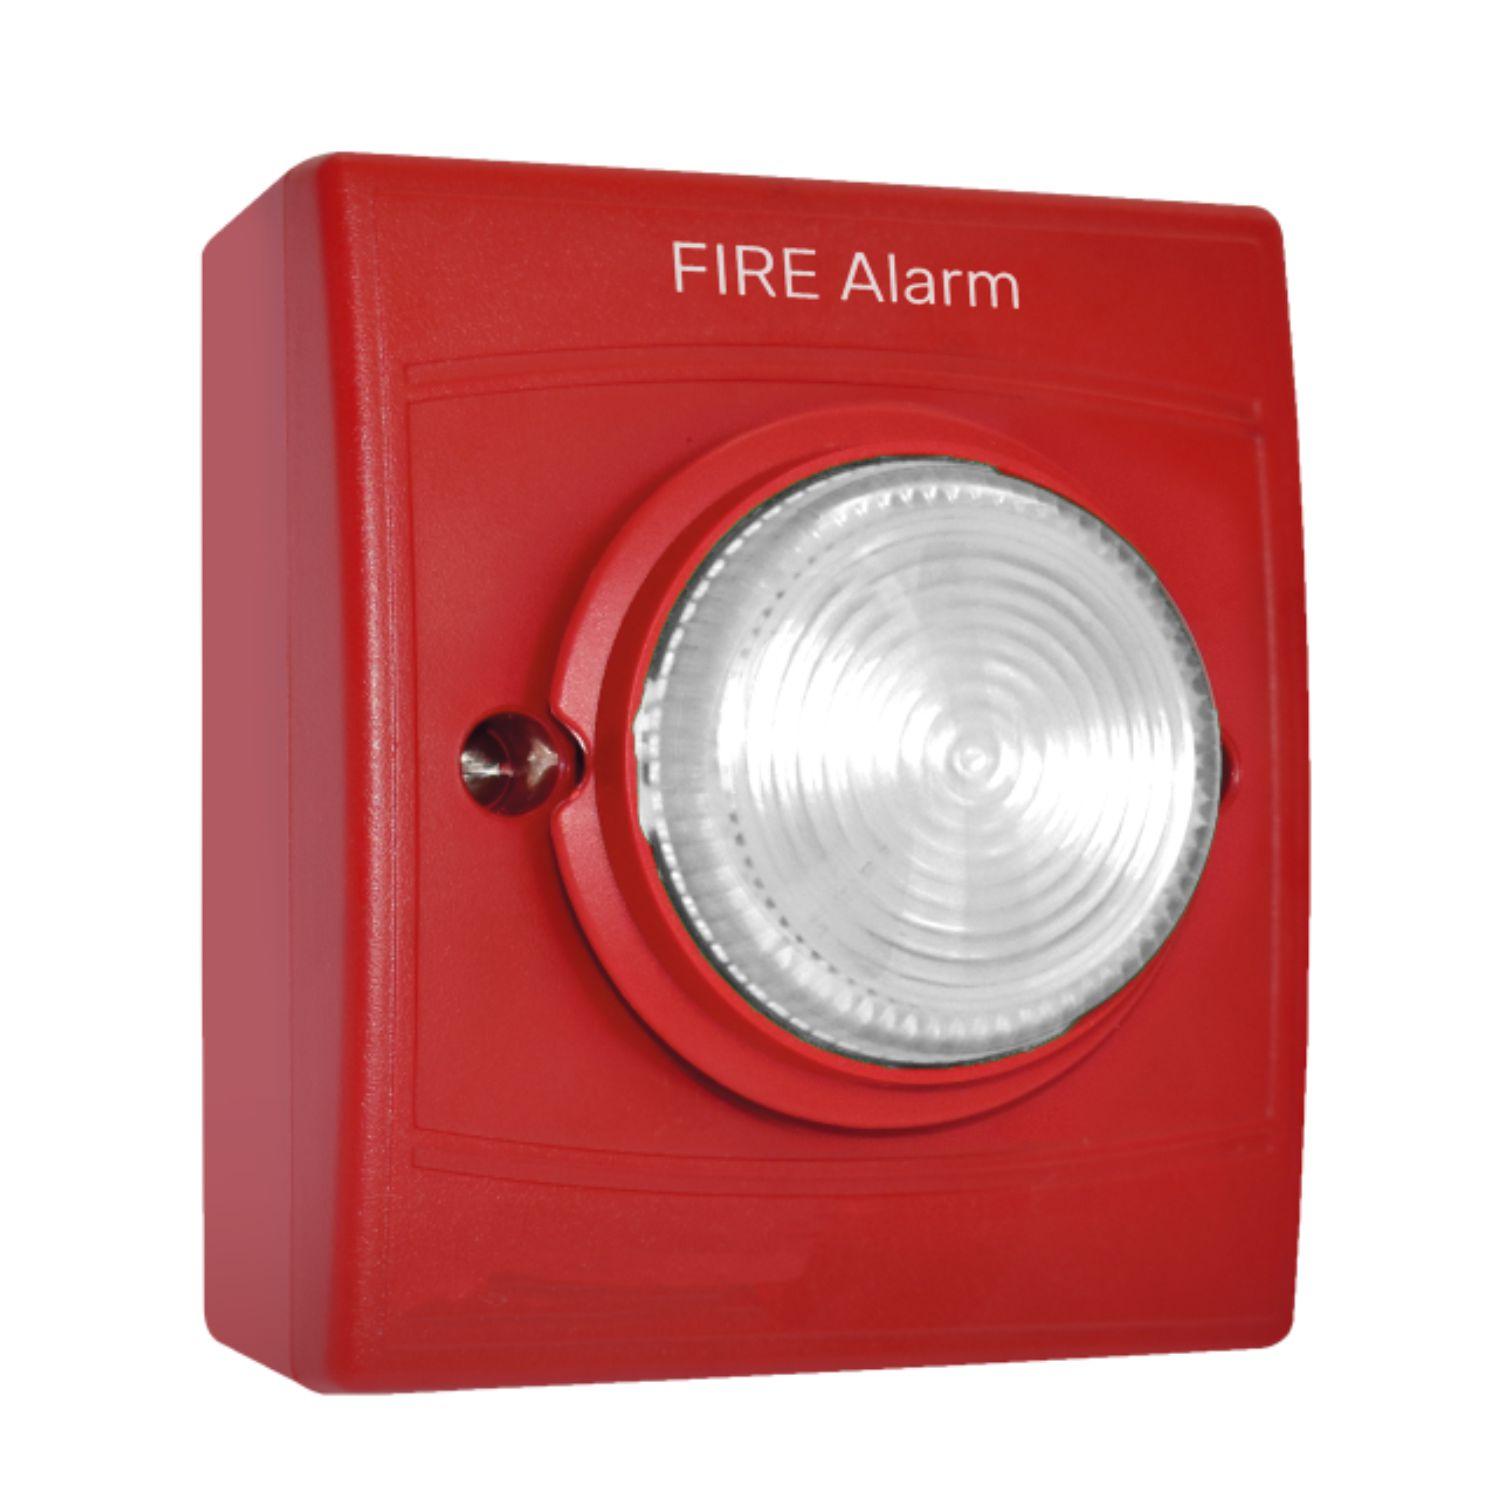 Identifire Tritone Sounder VID Flush Fit, Red Case...